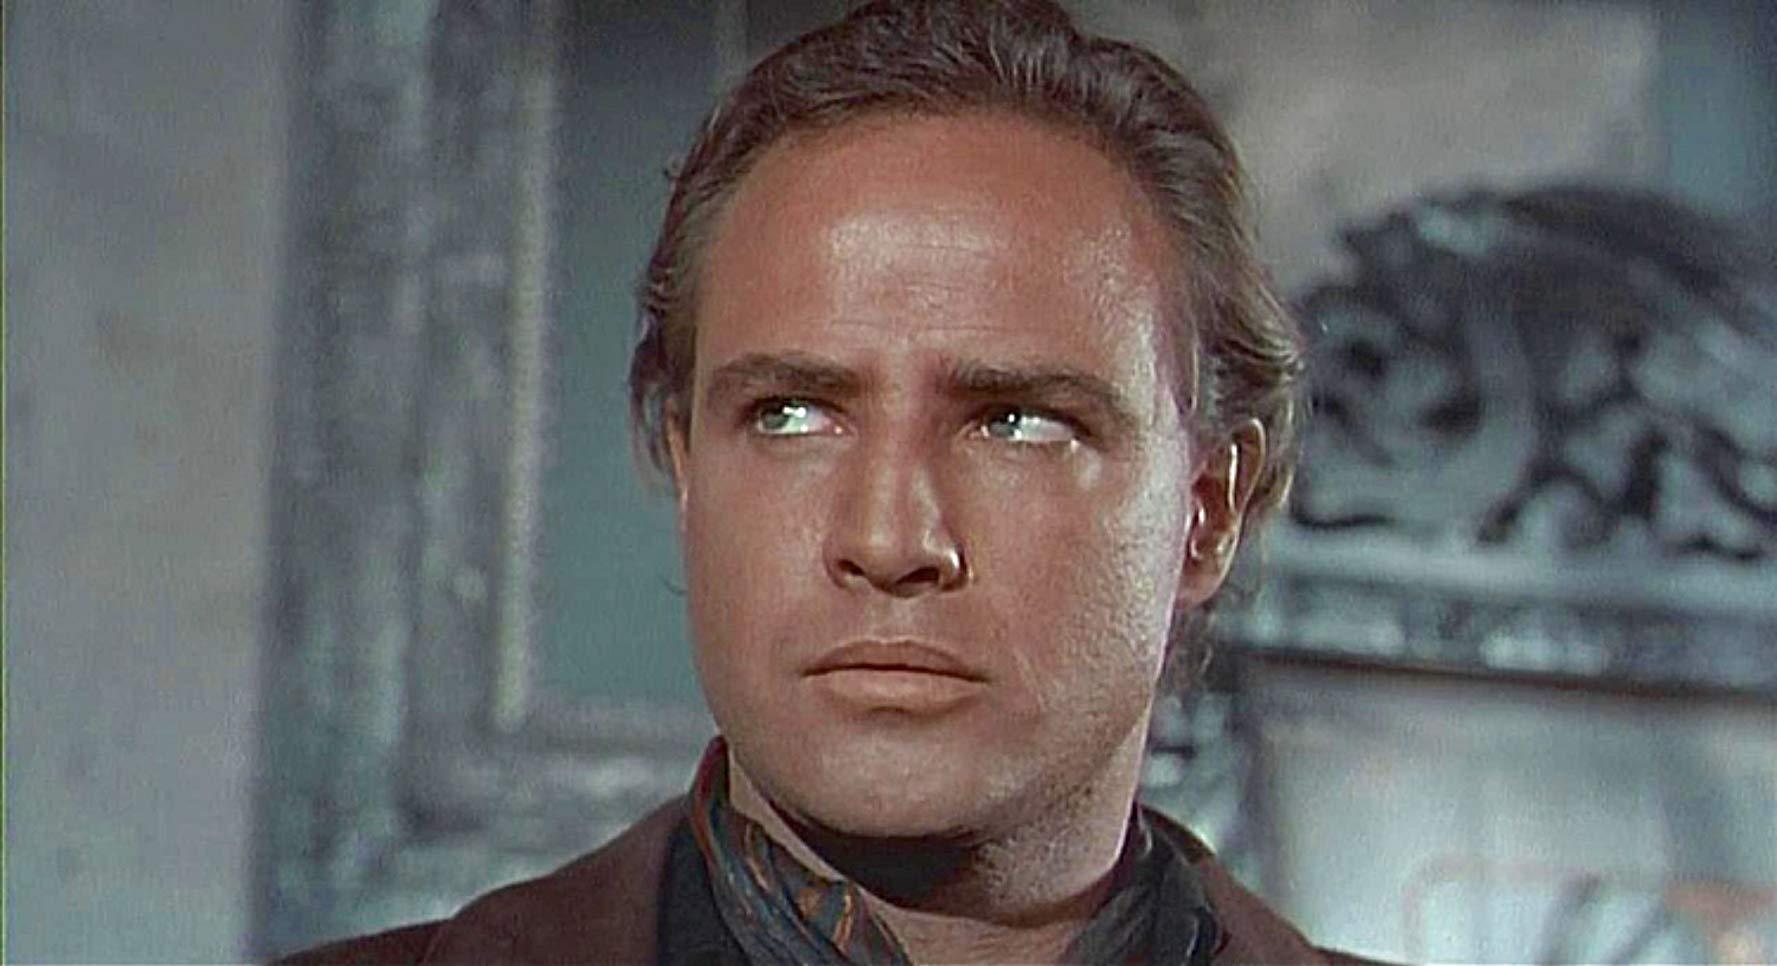 Marlon Brando One Eyed Jack - HD Wallpaper